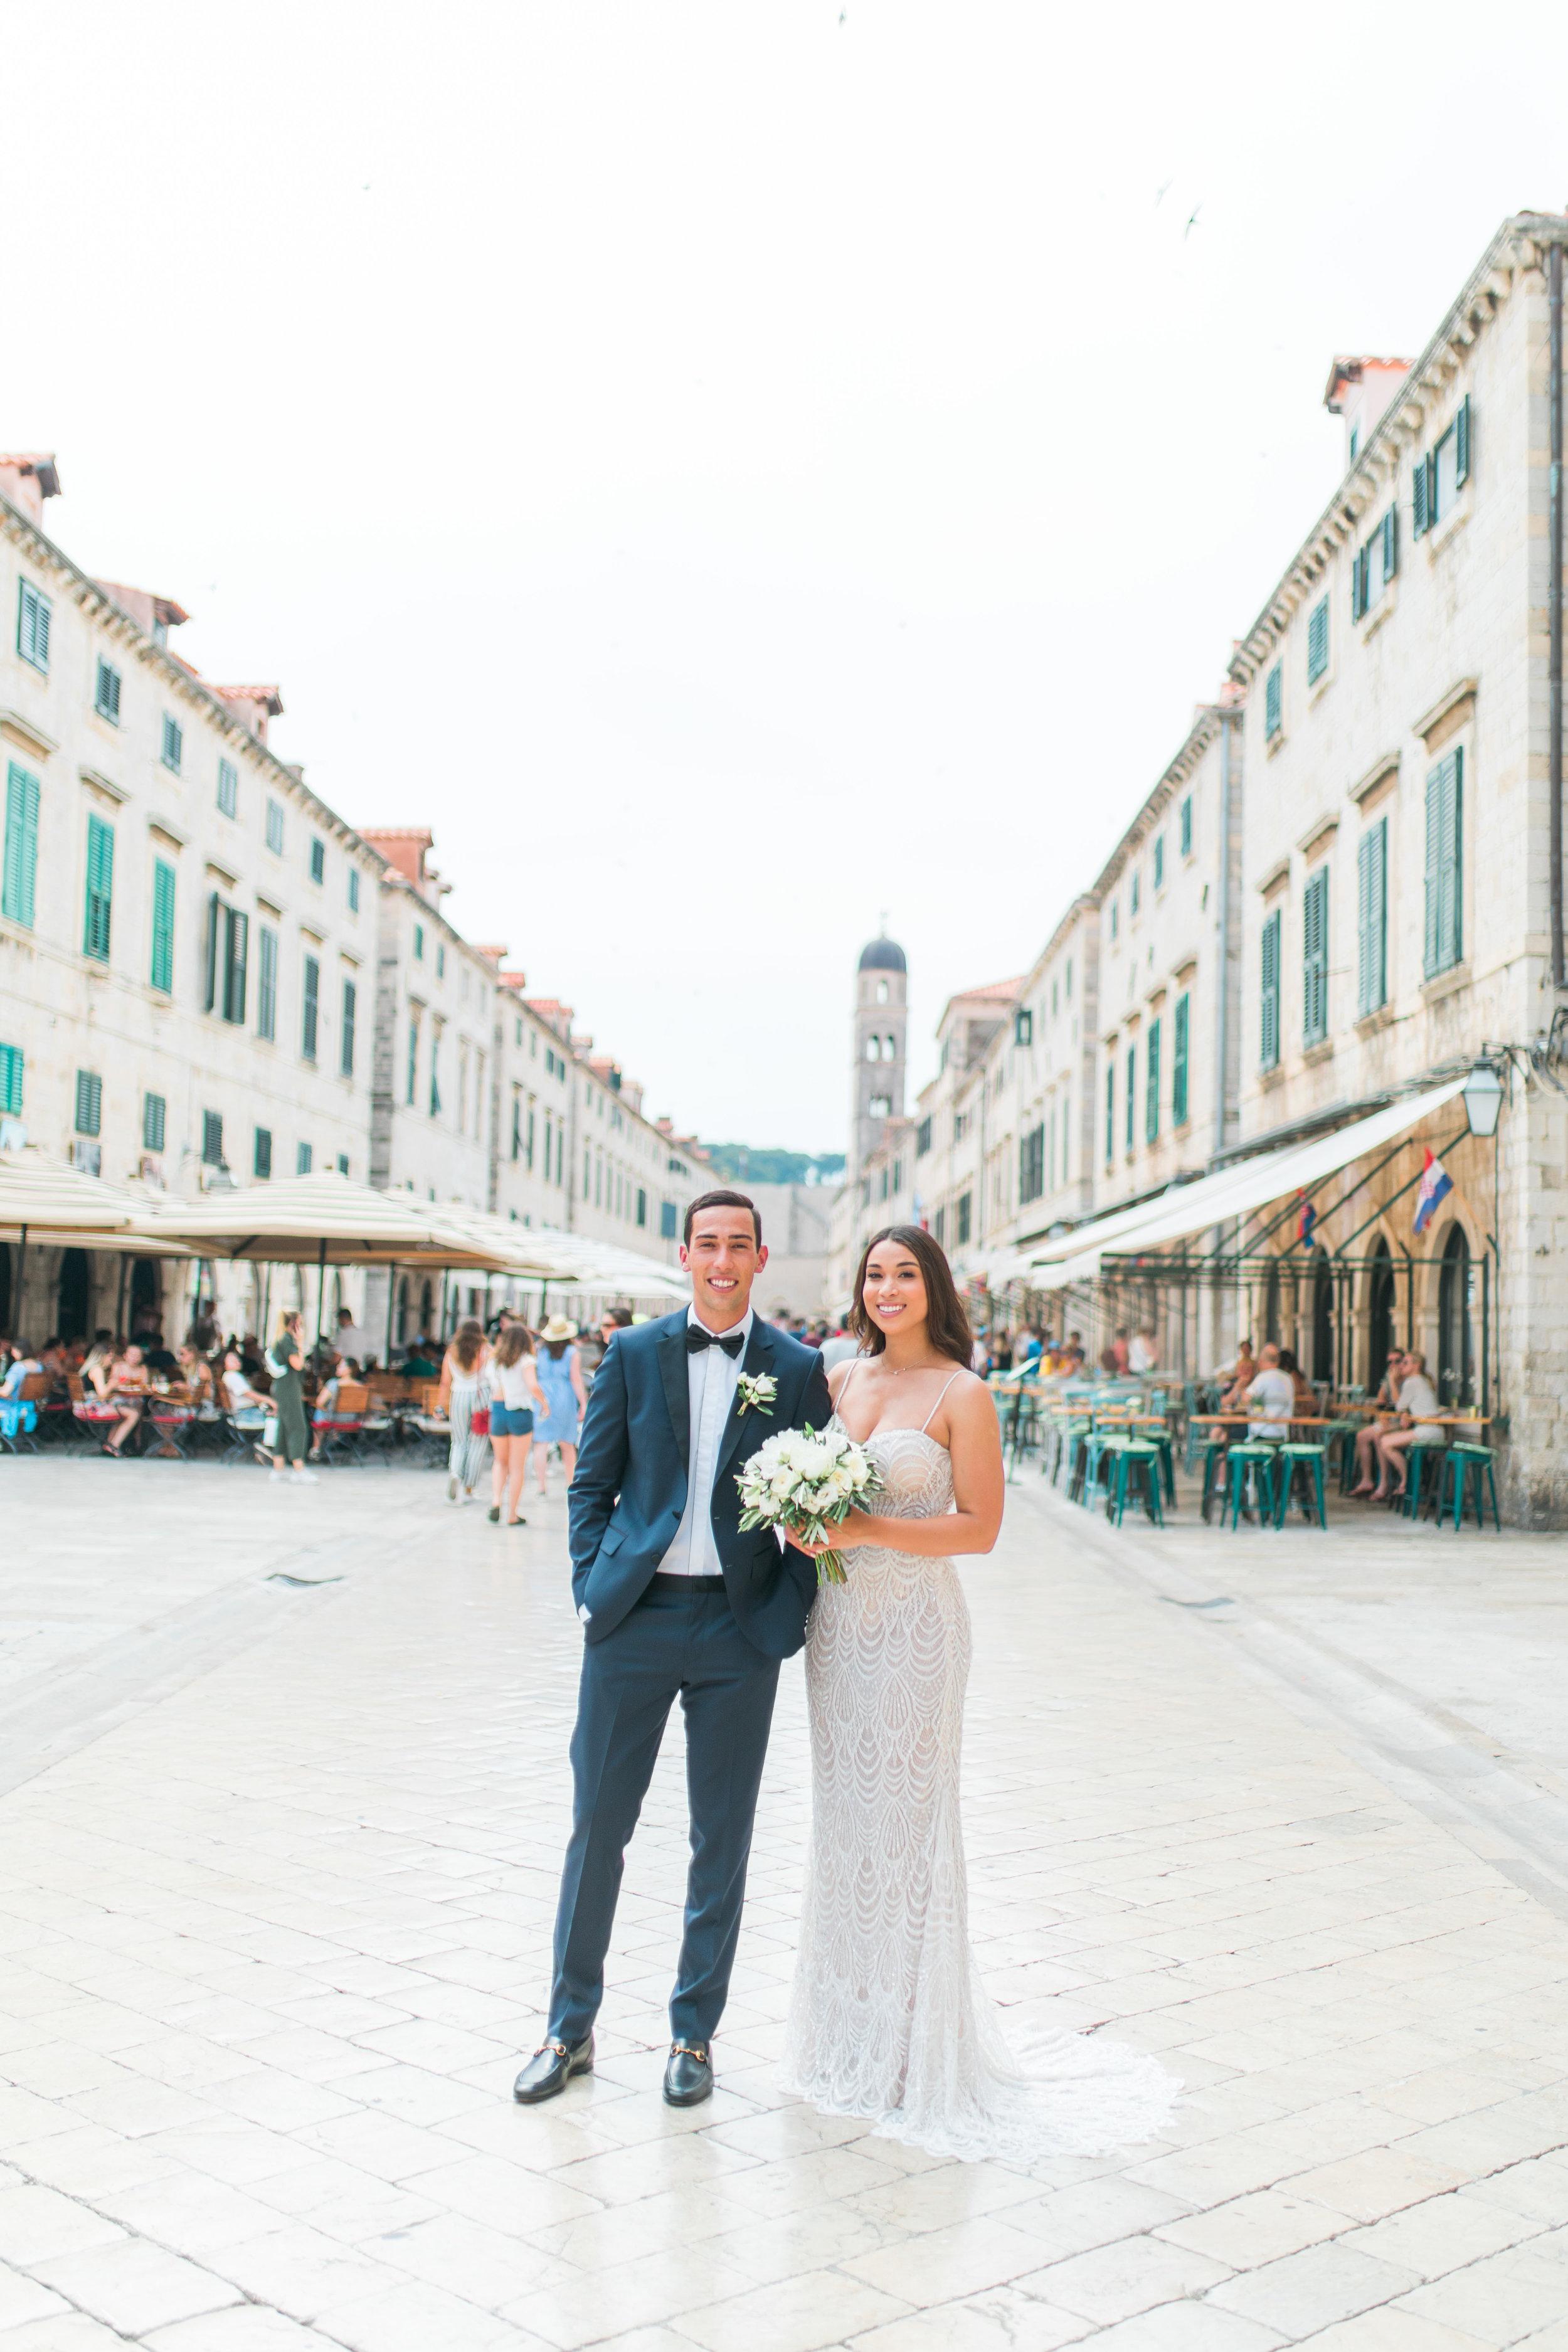 Dubrovnik-Wedding-Photographer-Croatia-Wedding-Photos-JBJ-Pictures-5.jpg